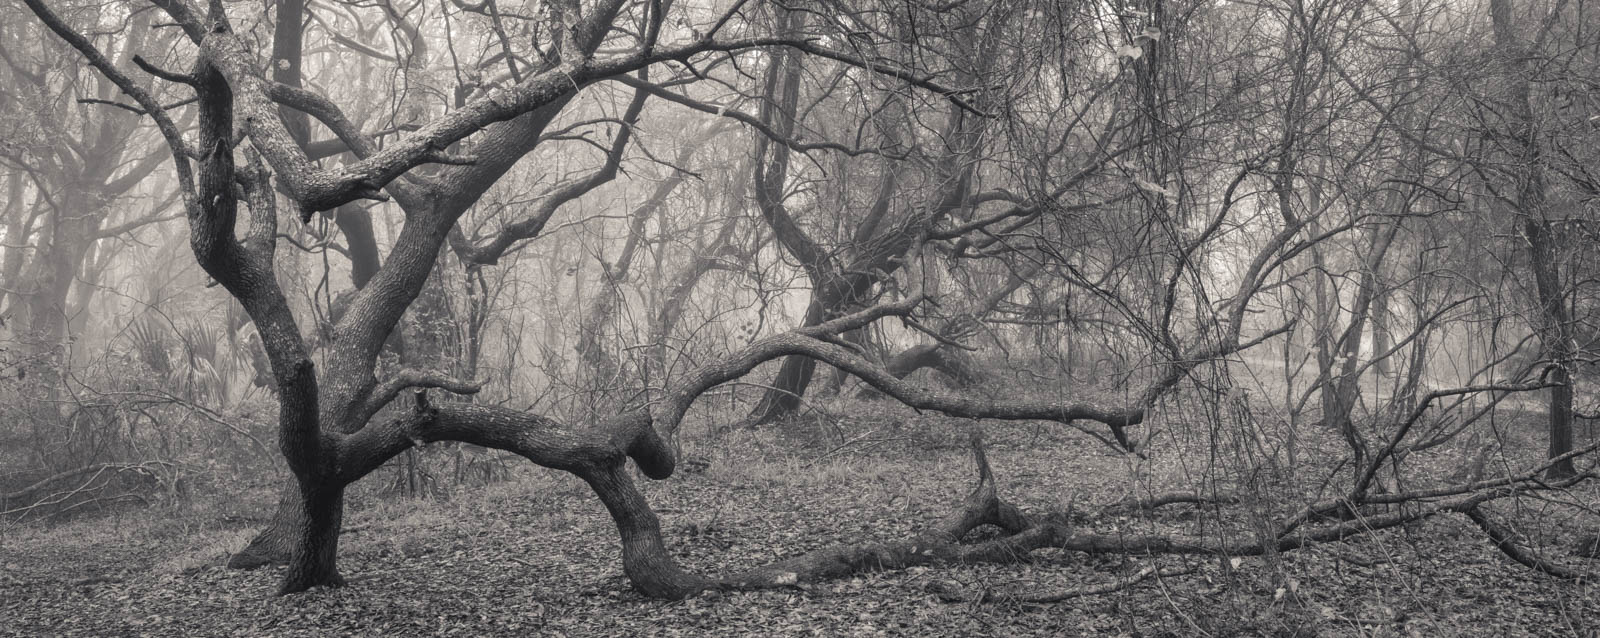 dauphin_island_shell_mounds_fog11